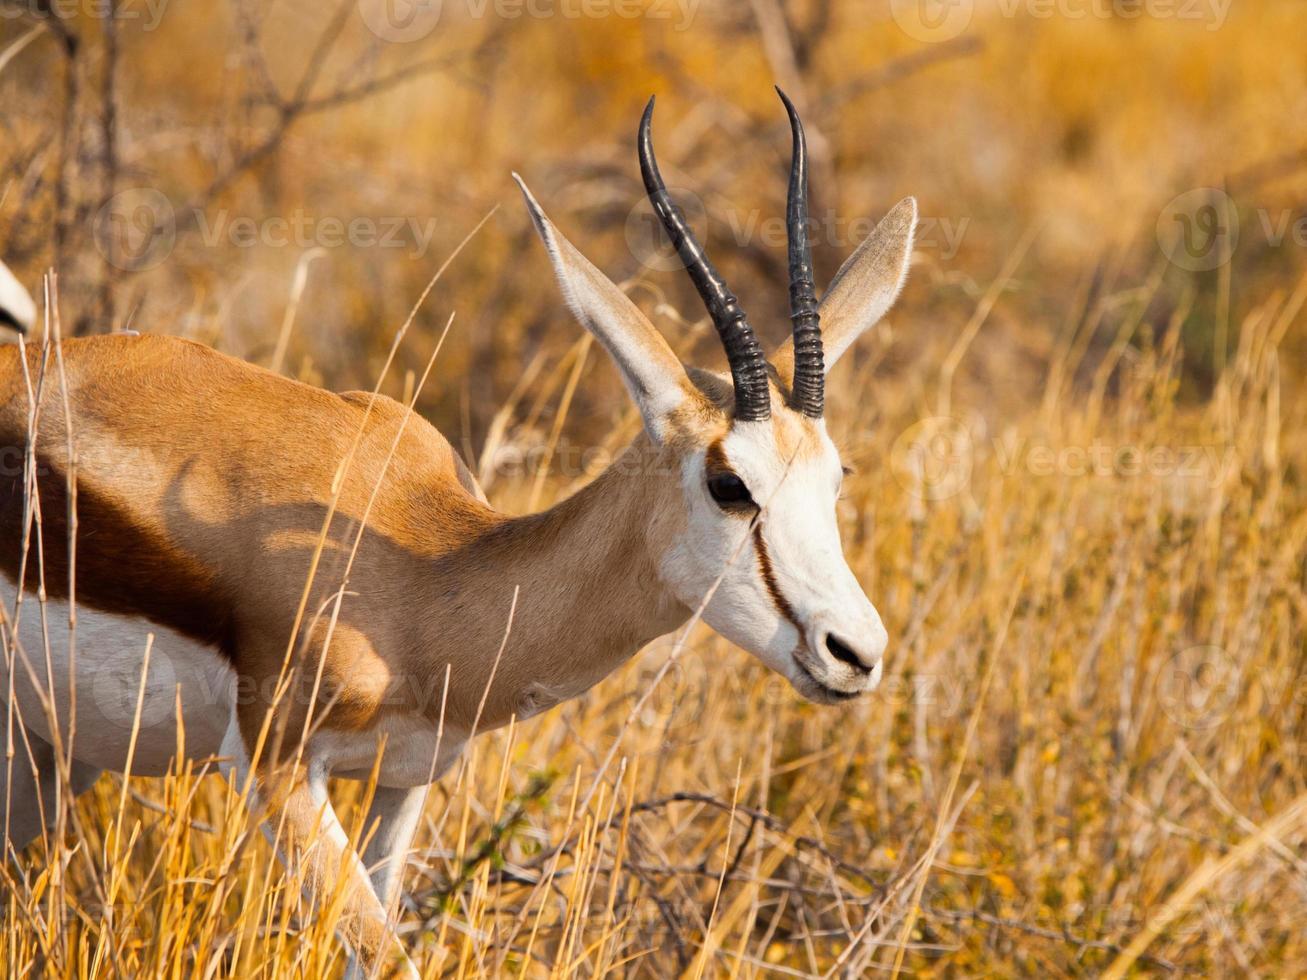 Impala masculino caminando en la sabana foto